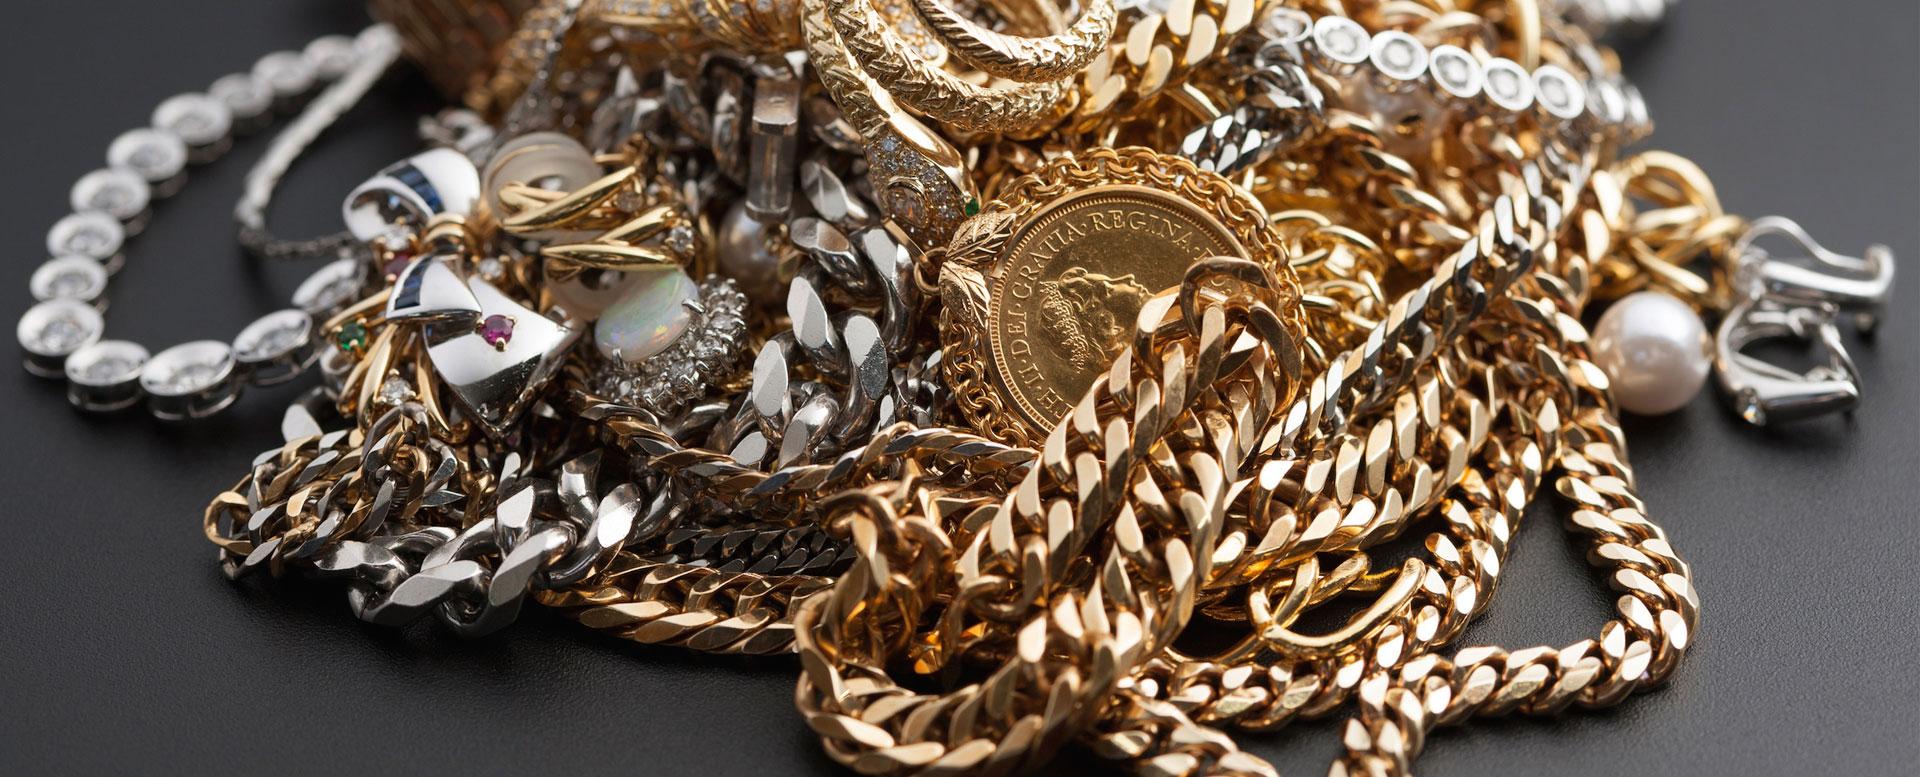 6e36d1c2dca9    Compra de oro bogota    Compraventa de oro    joyeria